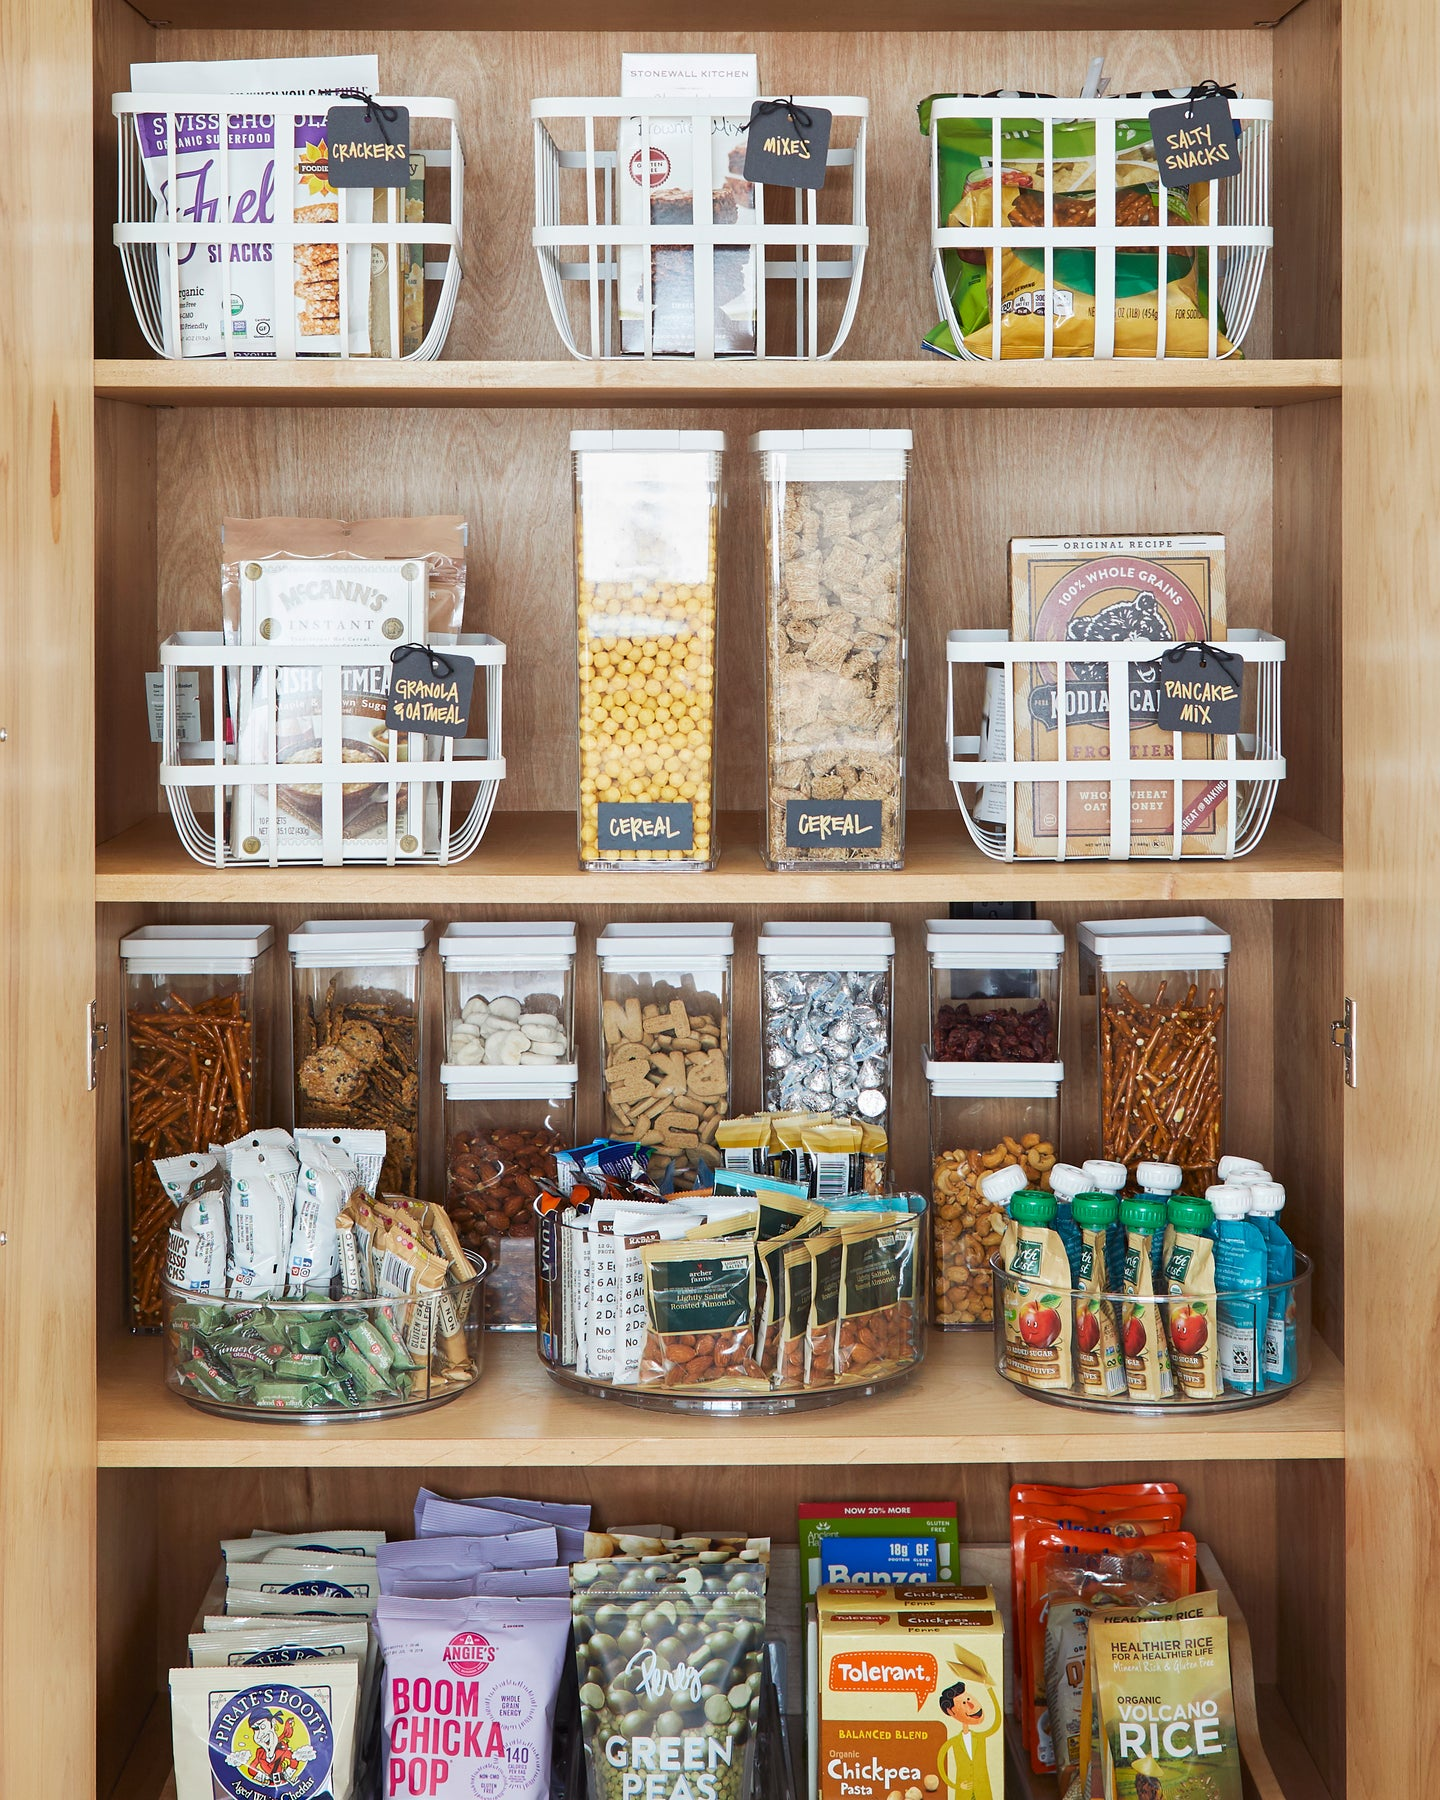 organized pantry with bins